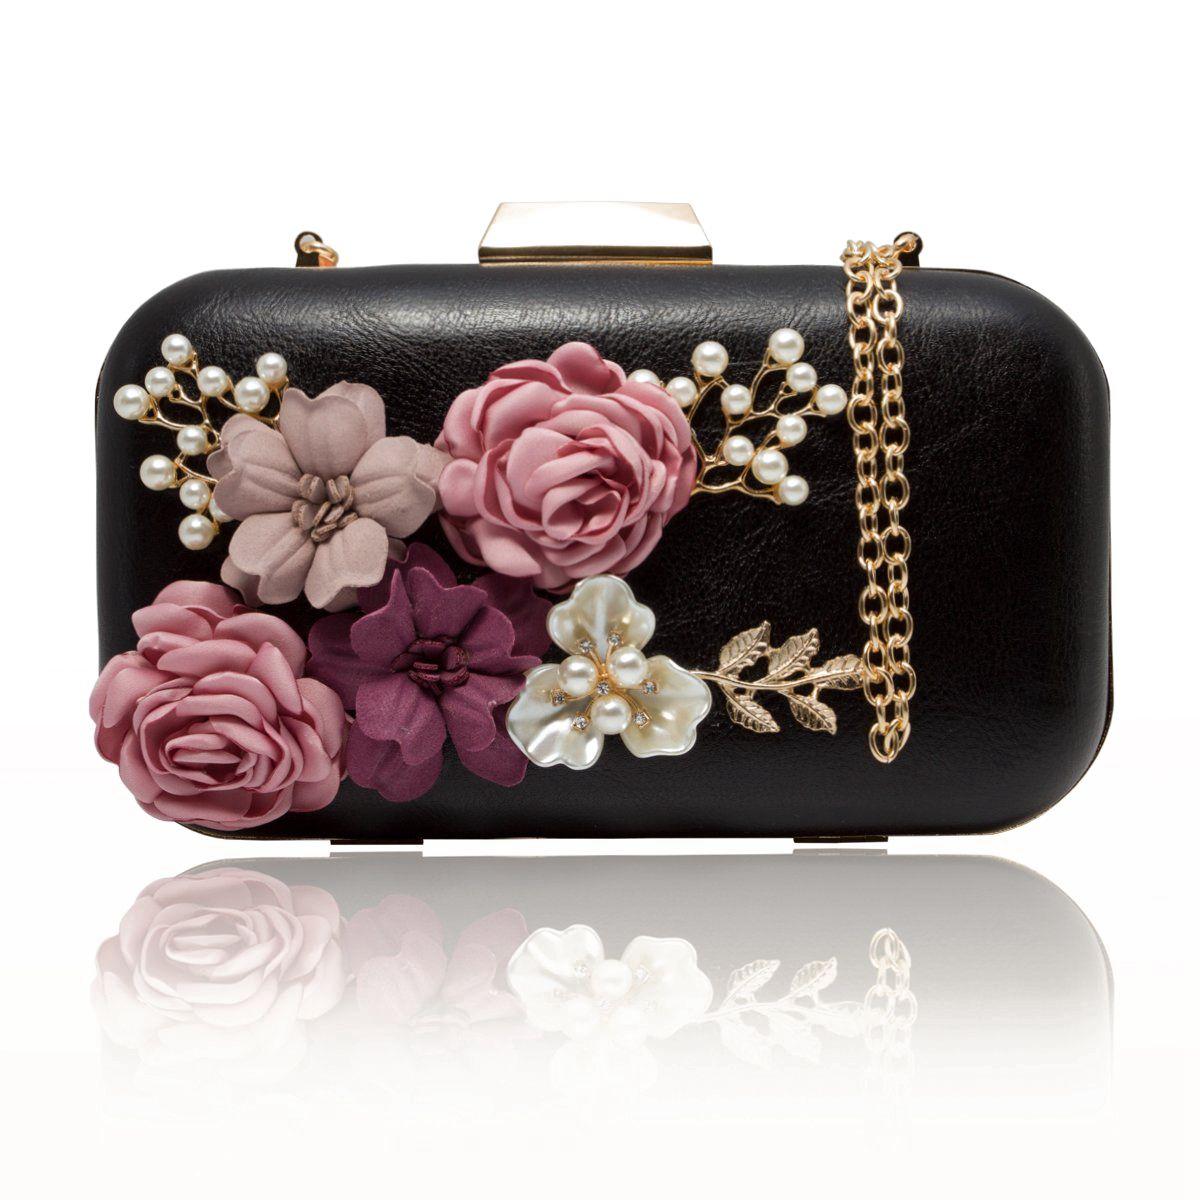 AFBC-Women Clutches Purses Bags Flower Leather Envelope Pearl Wallet Evening Handbag(Black)